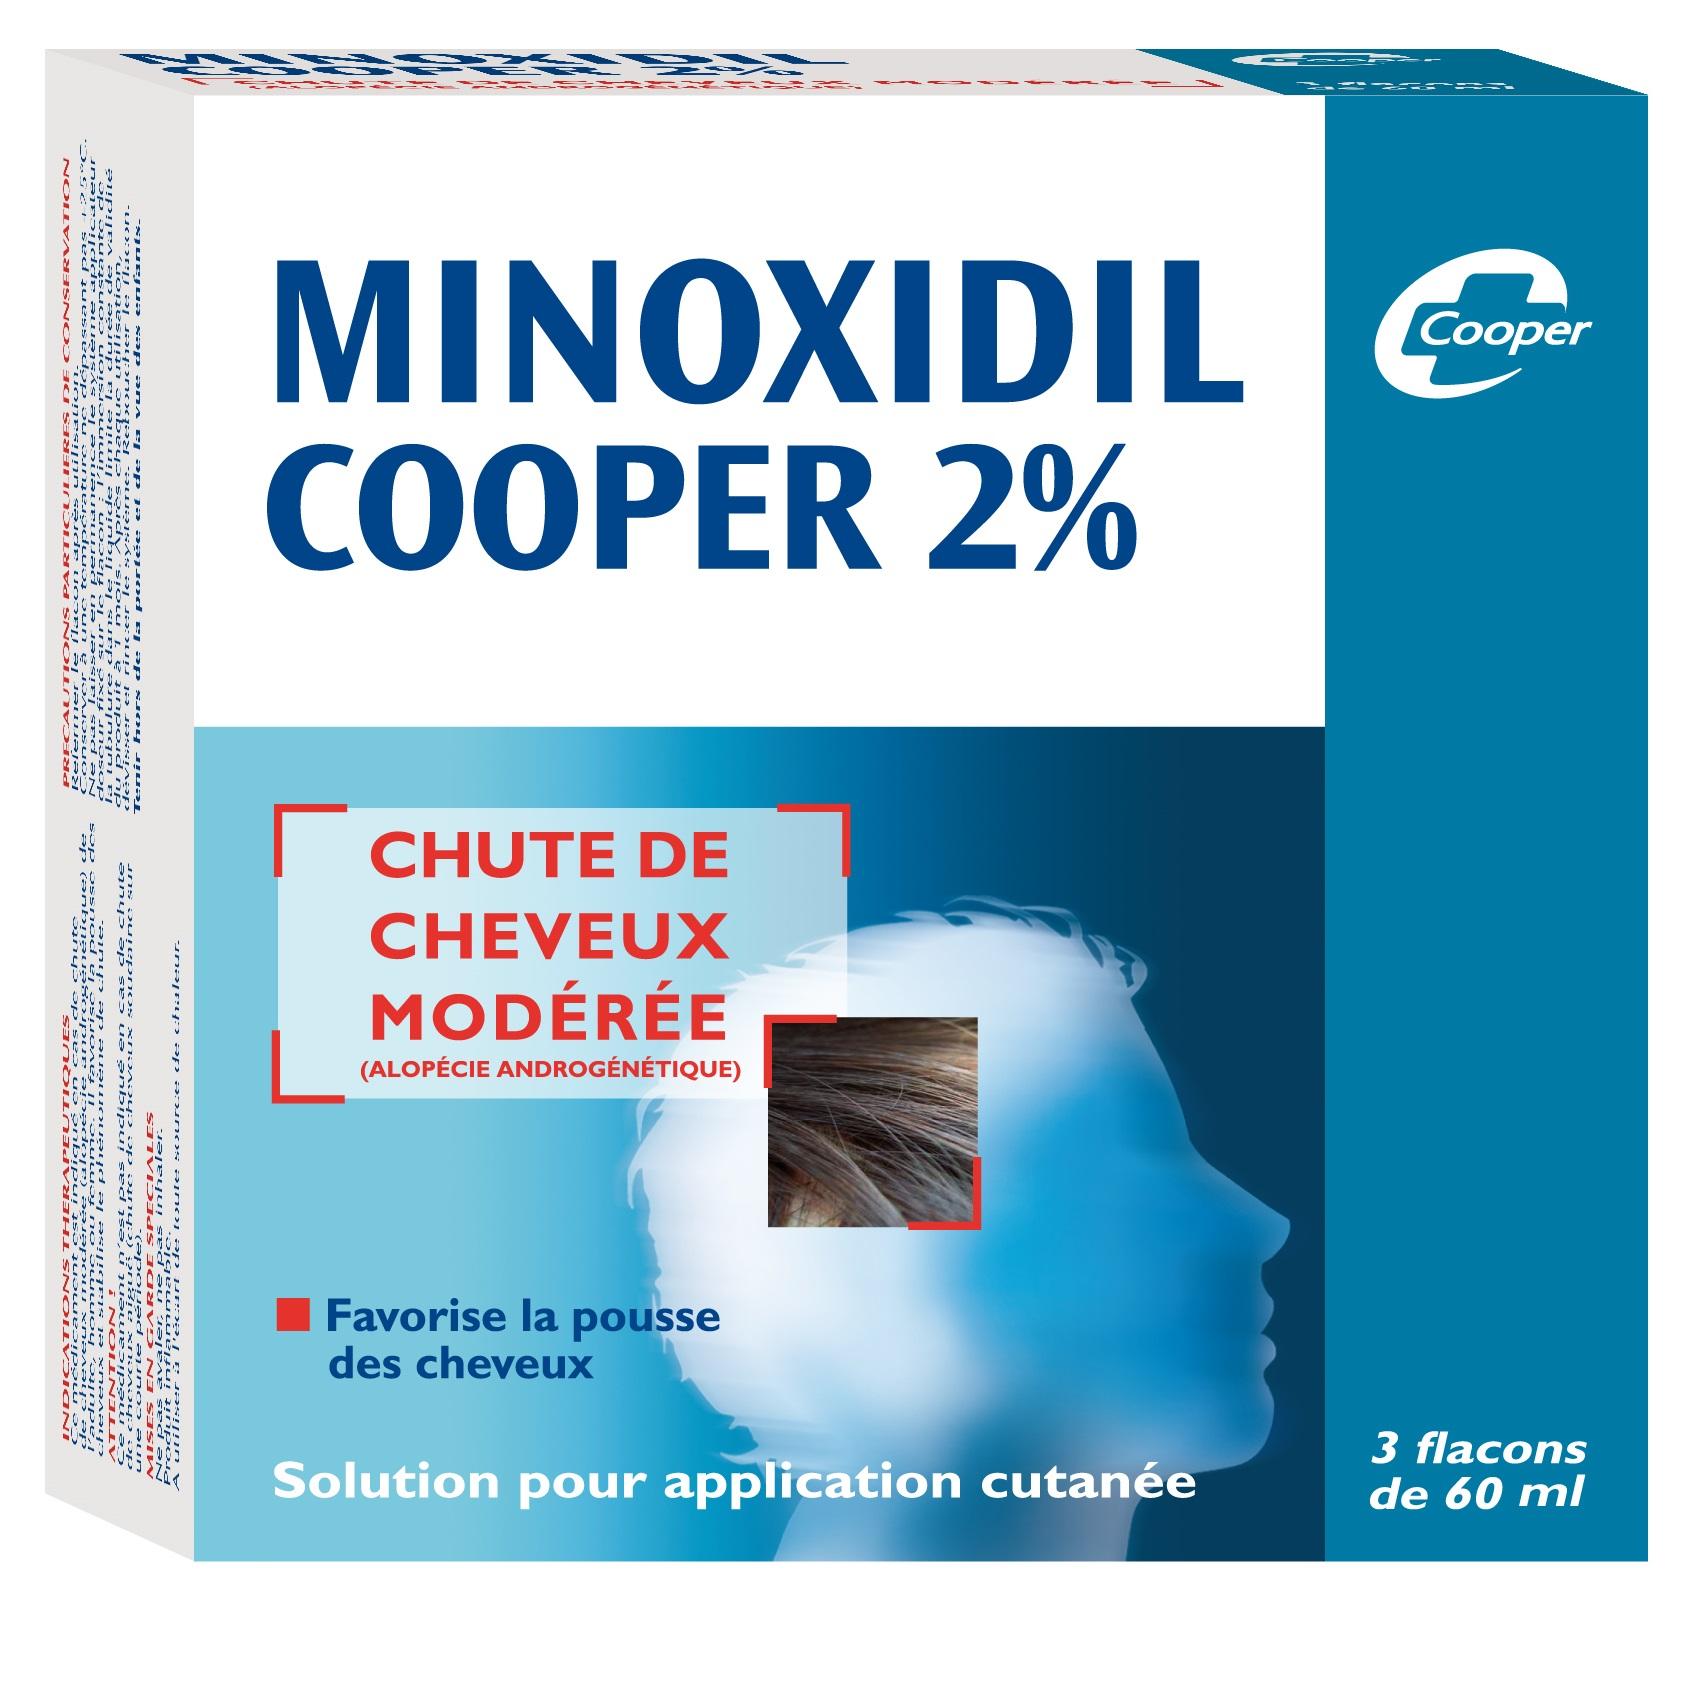 prix de minoxidil cooper 2 sol appli cut b 3 coop ration pharmaceutique fran aise. Black Bedroom Furniture Sets. Home Design Ideas